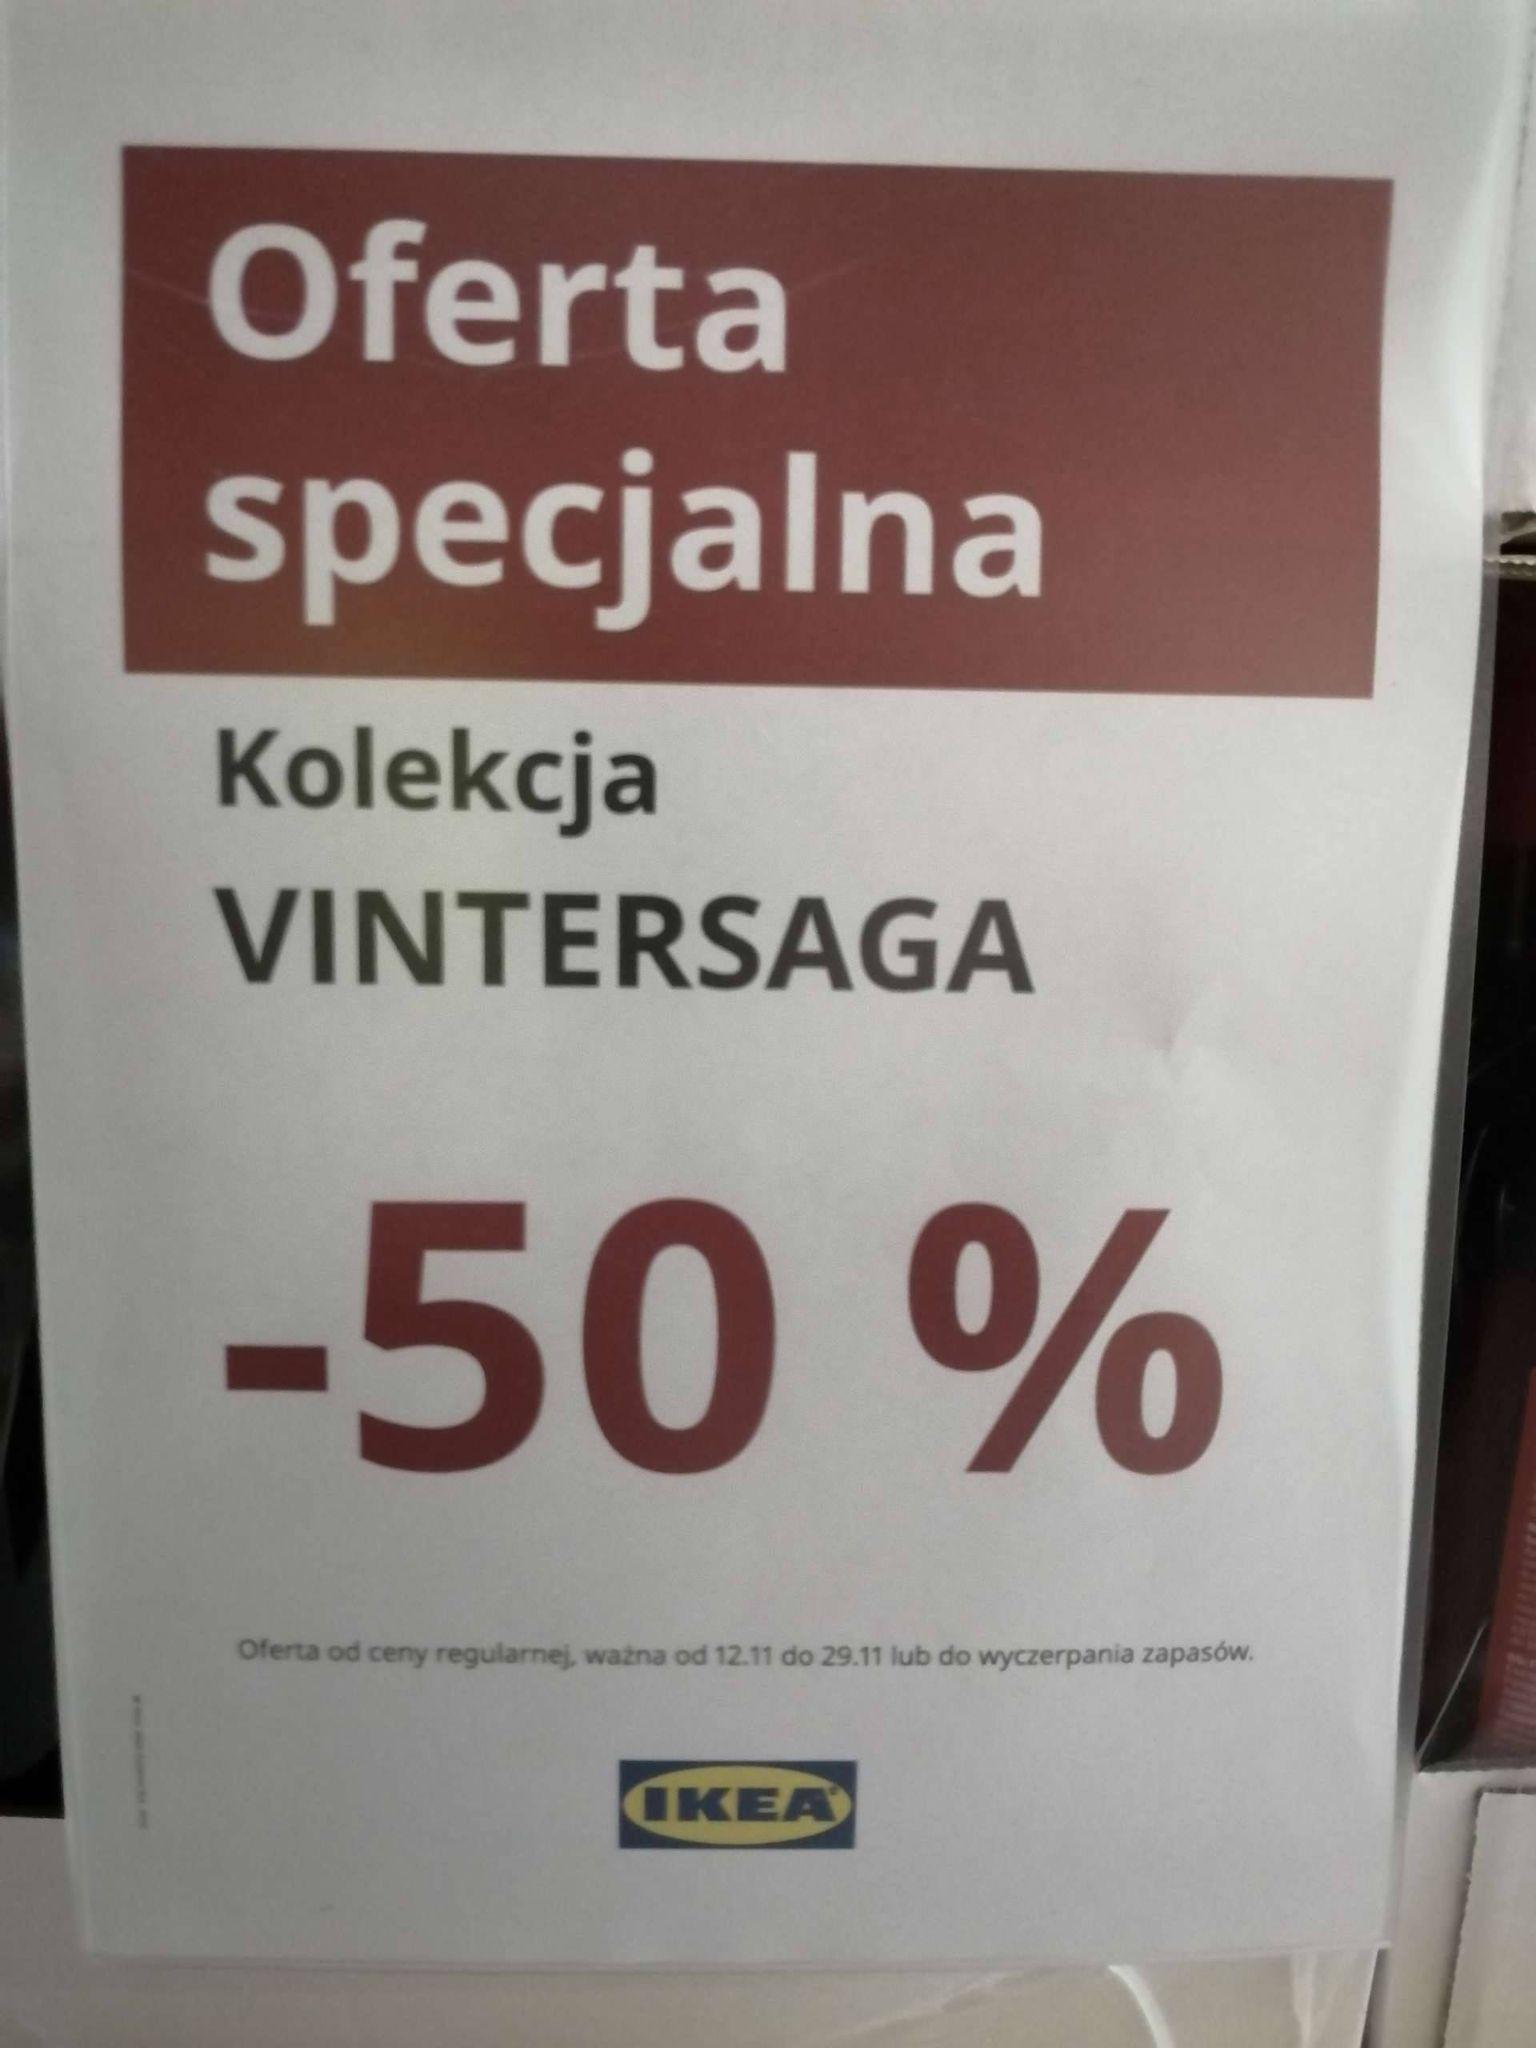 IKEA Kolekcja VINTERSAGA - 50% na sklepiku szwedzkim KATO